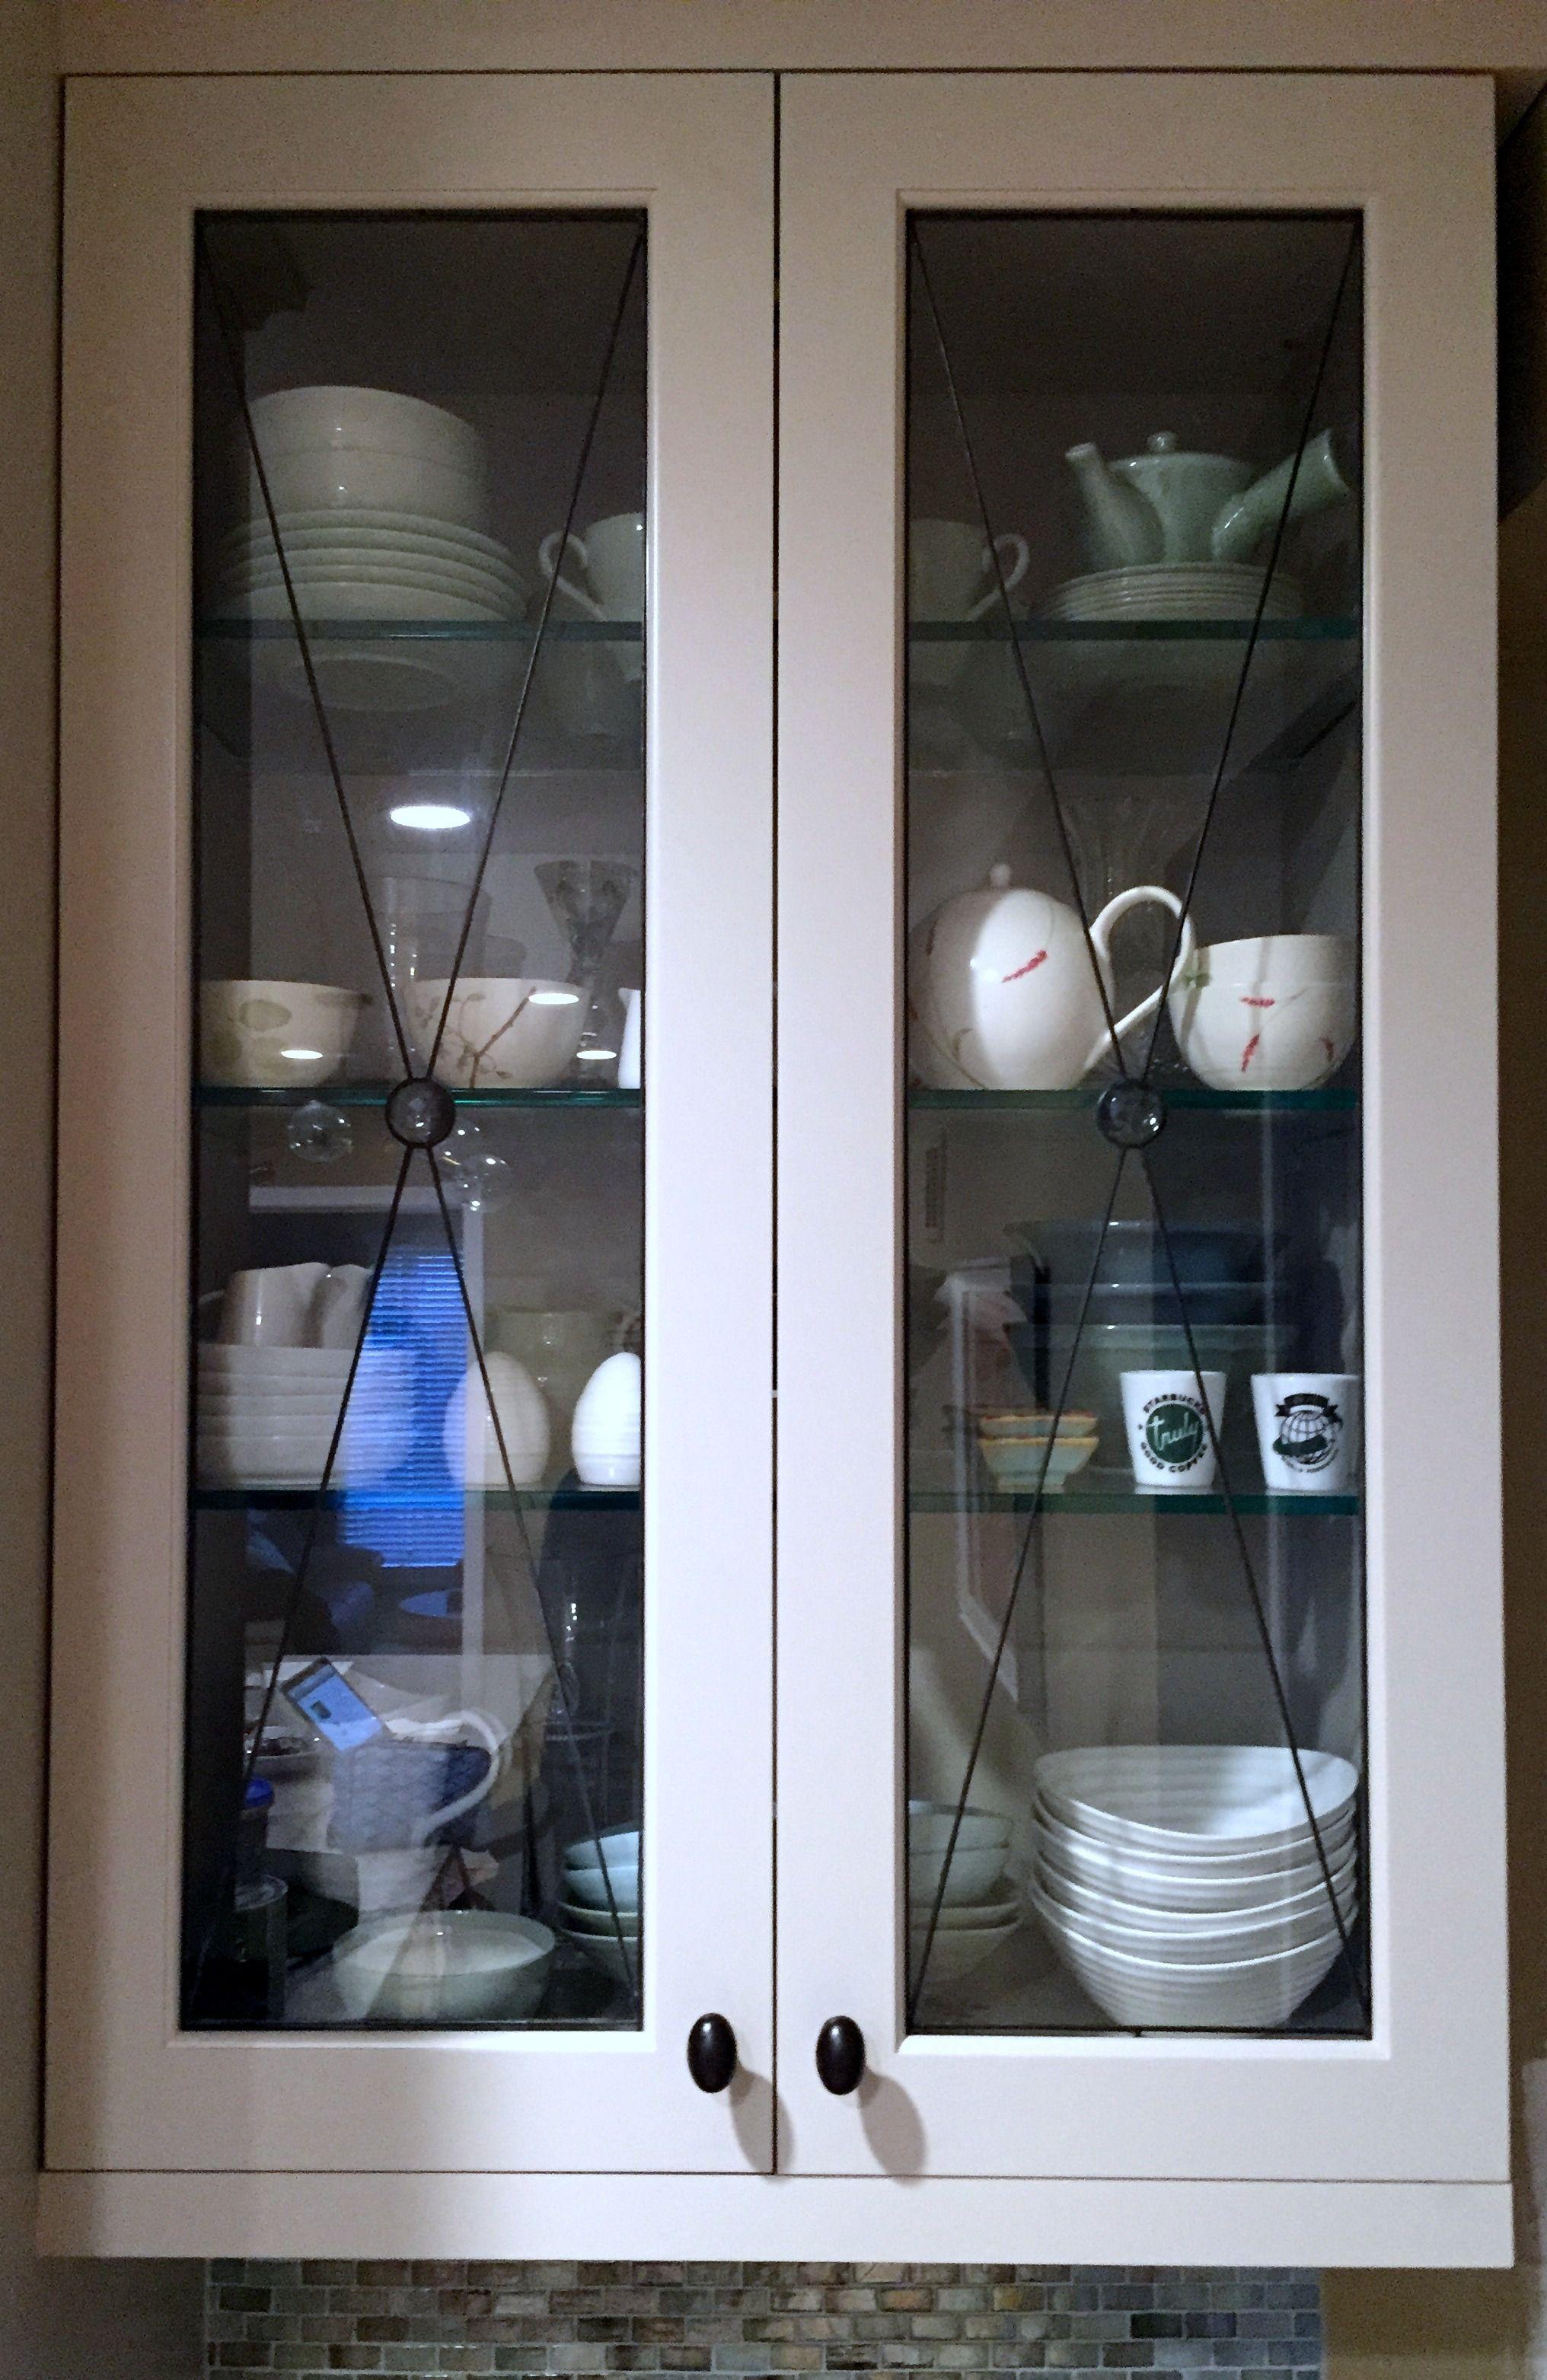 kitchen cabinet door glass inserts 2020 in 2020 door glass inserts kitchen cabinets glass on kitchen cabinets glass inserts id=12384